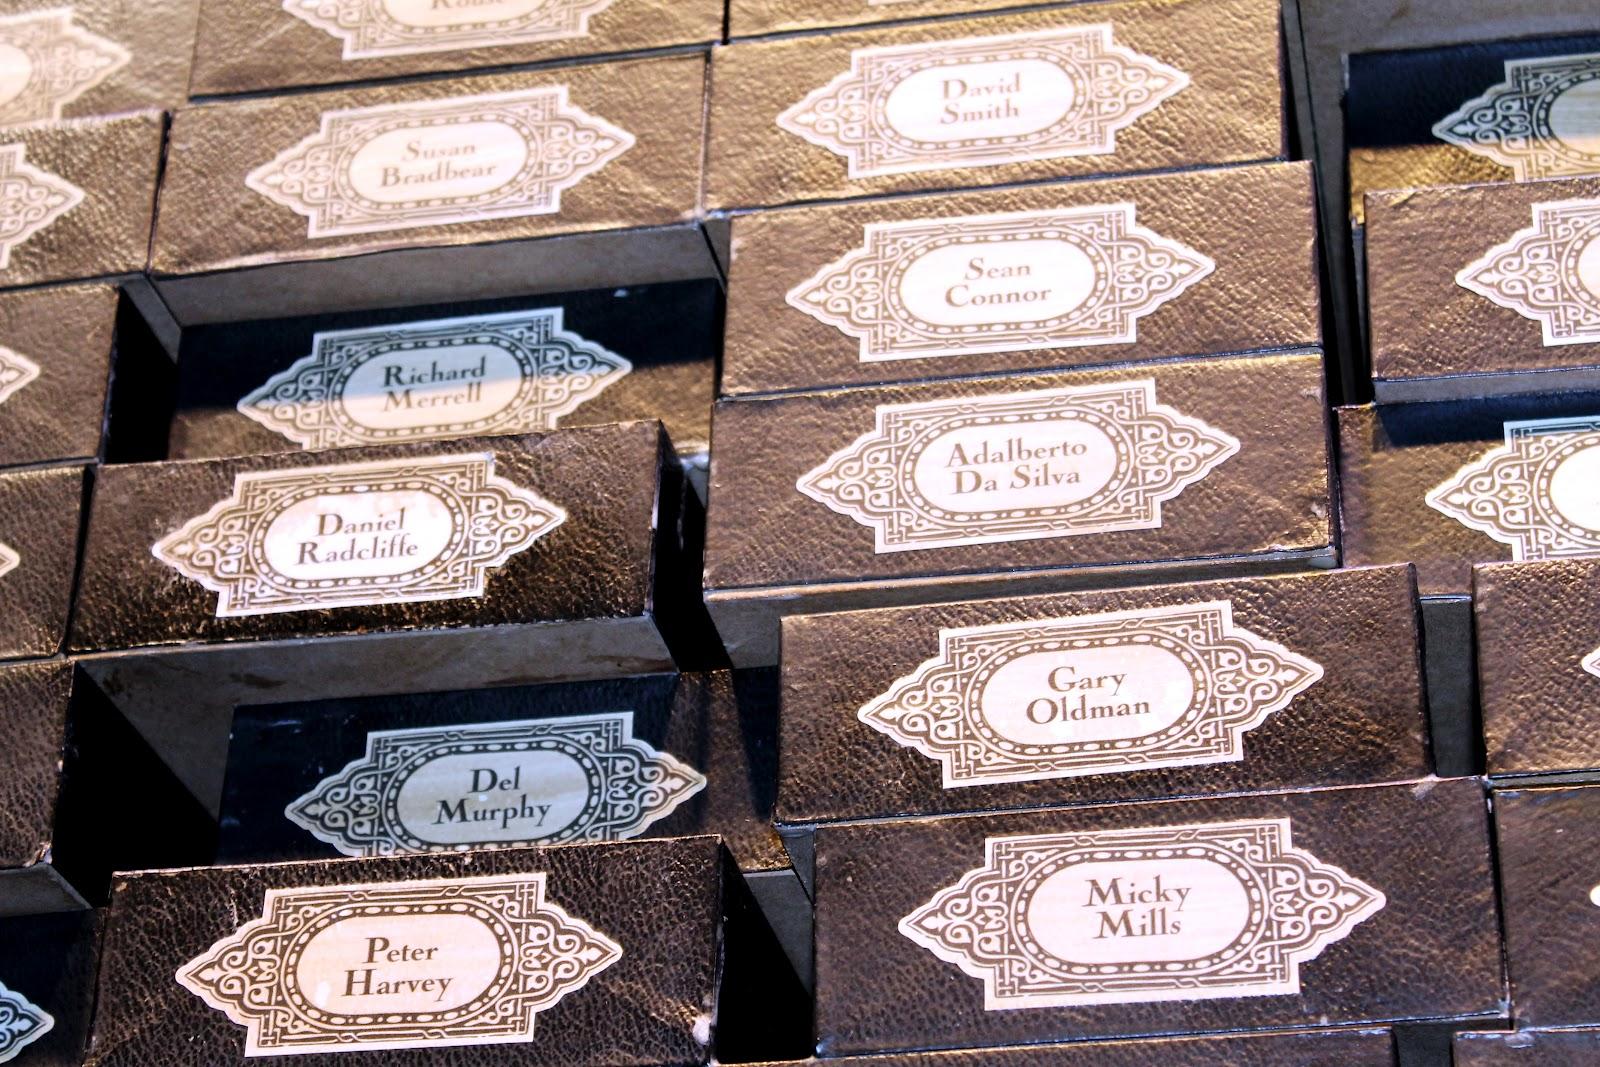 http://2.bp.blogspot.com/-DAciLoaM81s/UBsEOl2wtlI/AAAAAAAALQY/1JICNJ4FW_Y/s1600/Names+on+wands+Harry+Potter+tour+Gary+Oldman+Daniel+Radcliffe.jpg